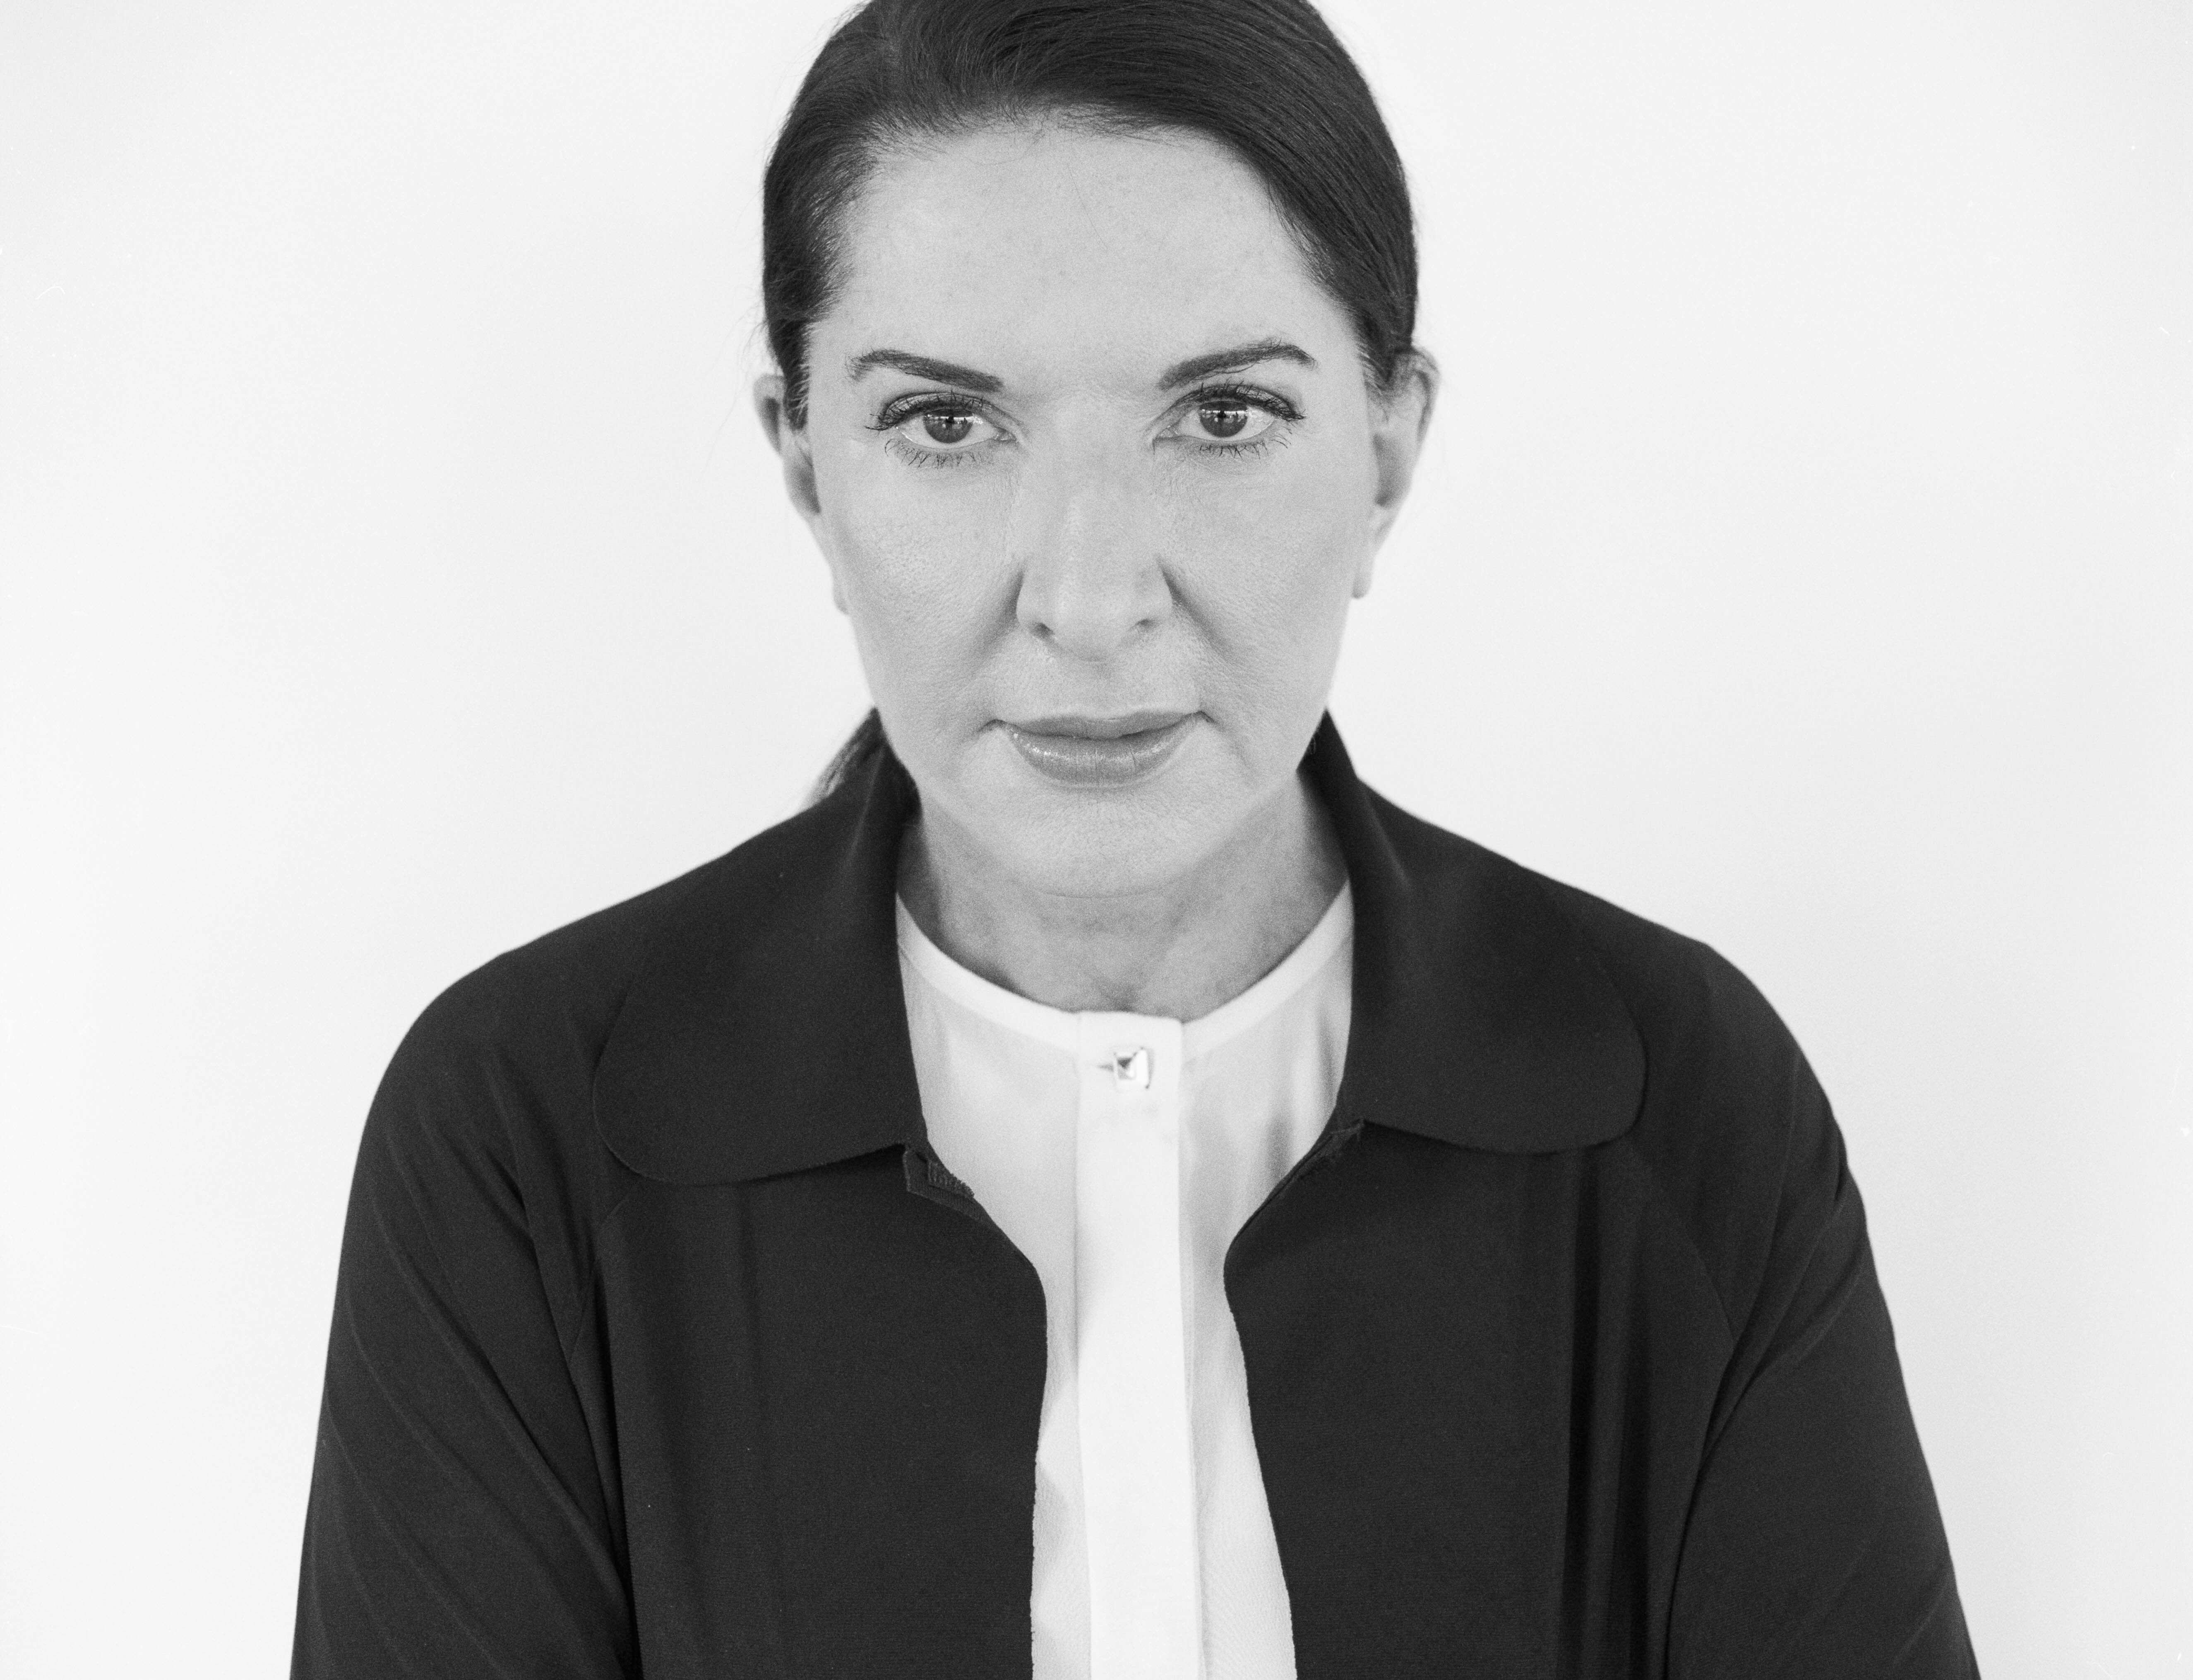 Marina Abramovic receives the Princess of Asturias Award for the Arts